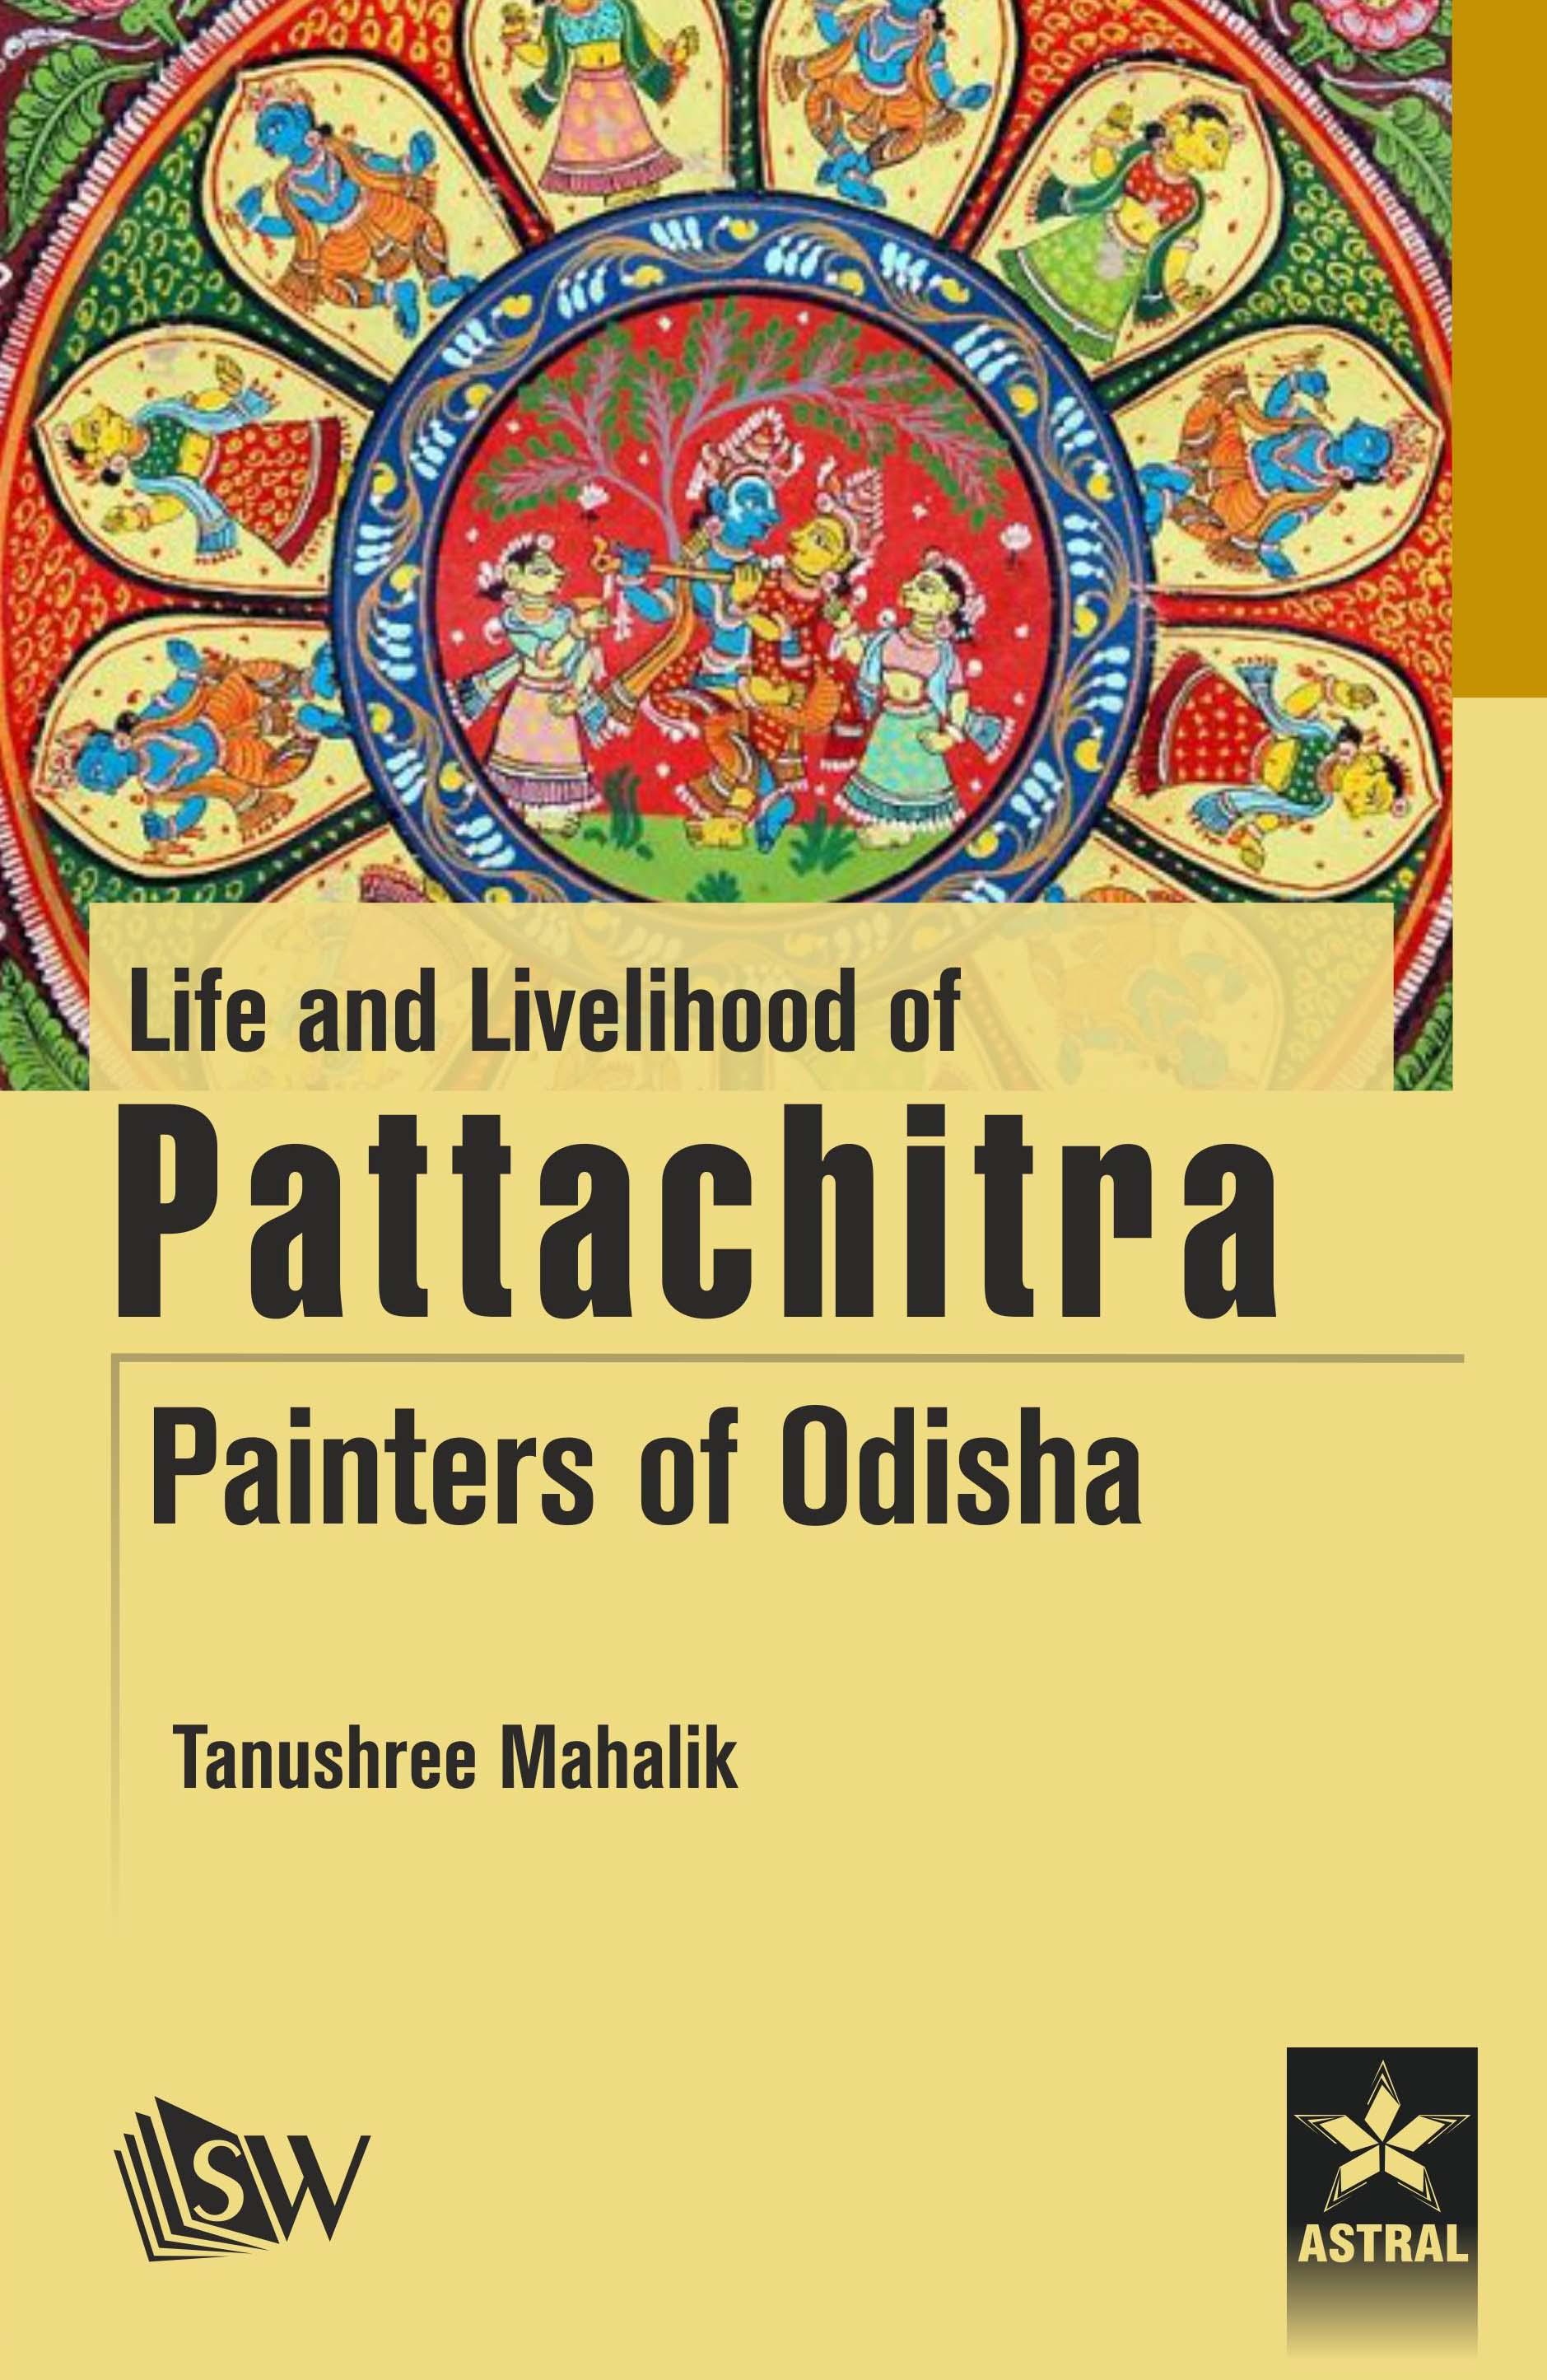 Life and  Livelihood of Pattachitra Paniters of Odisha By Mahalik, Tanushree